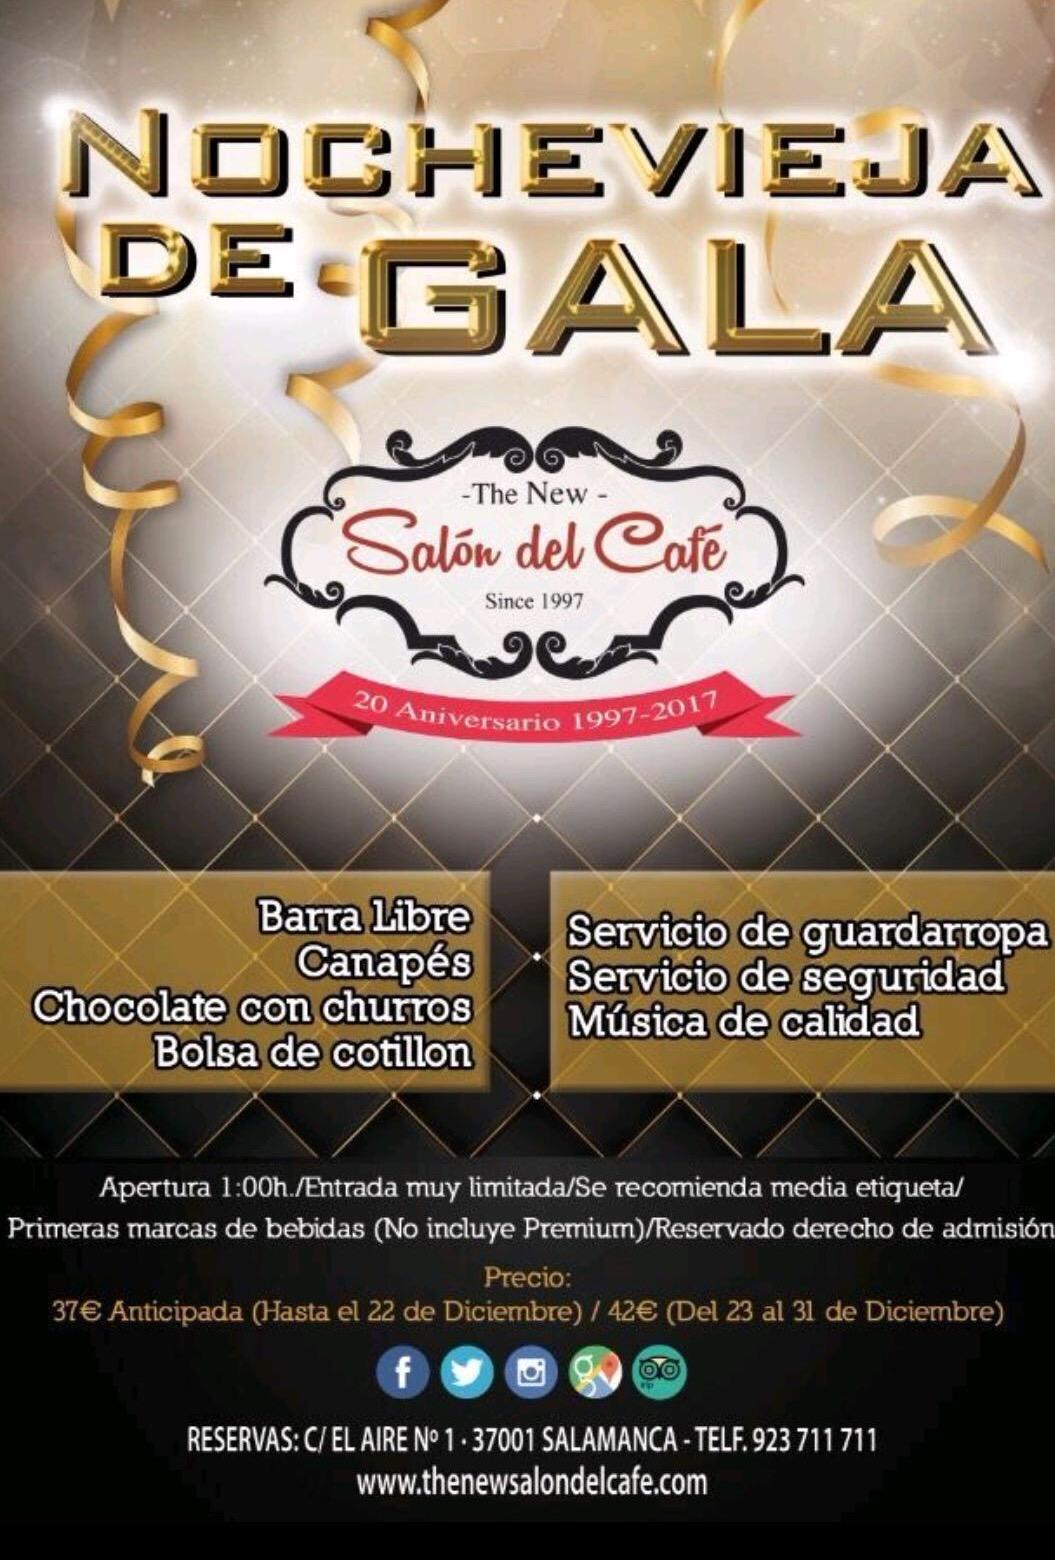 Nochevieja de Gala